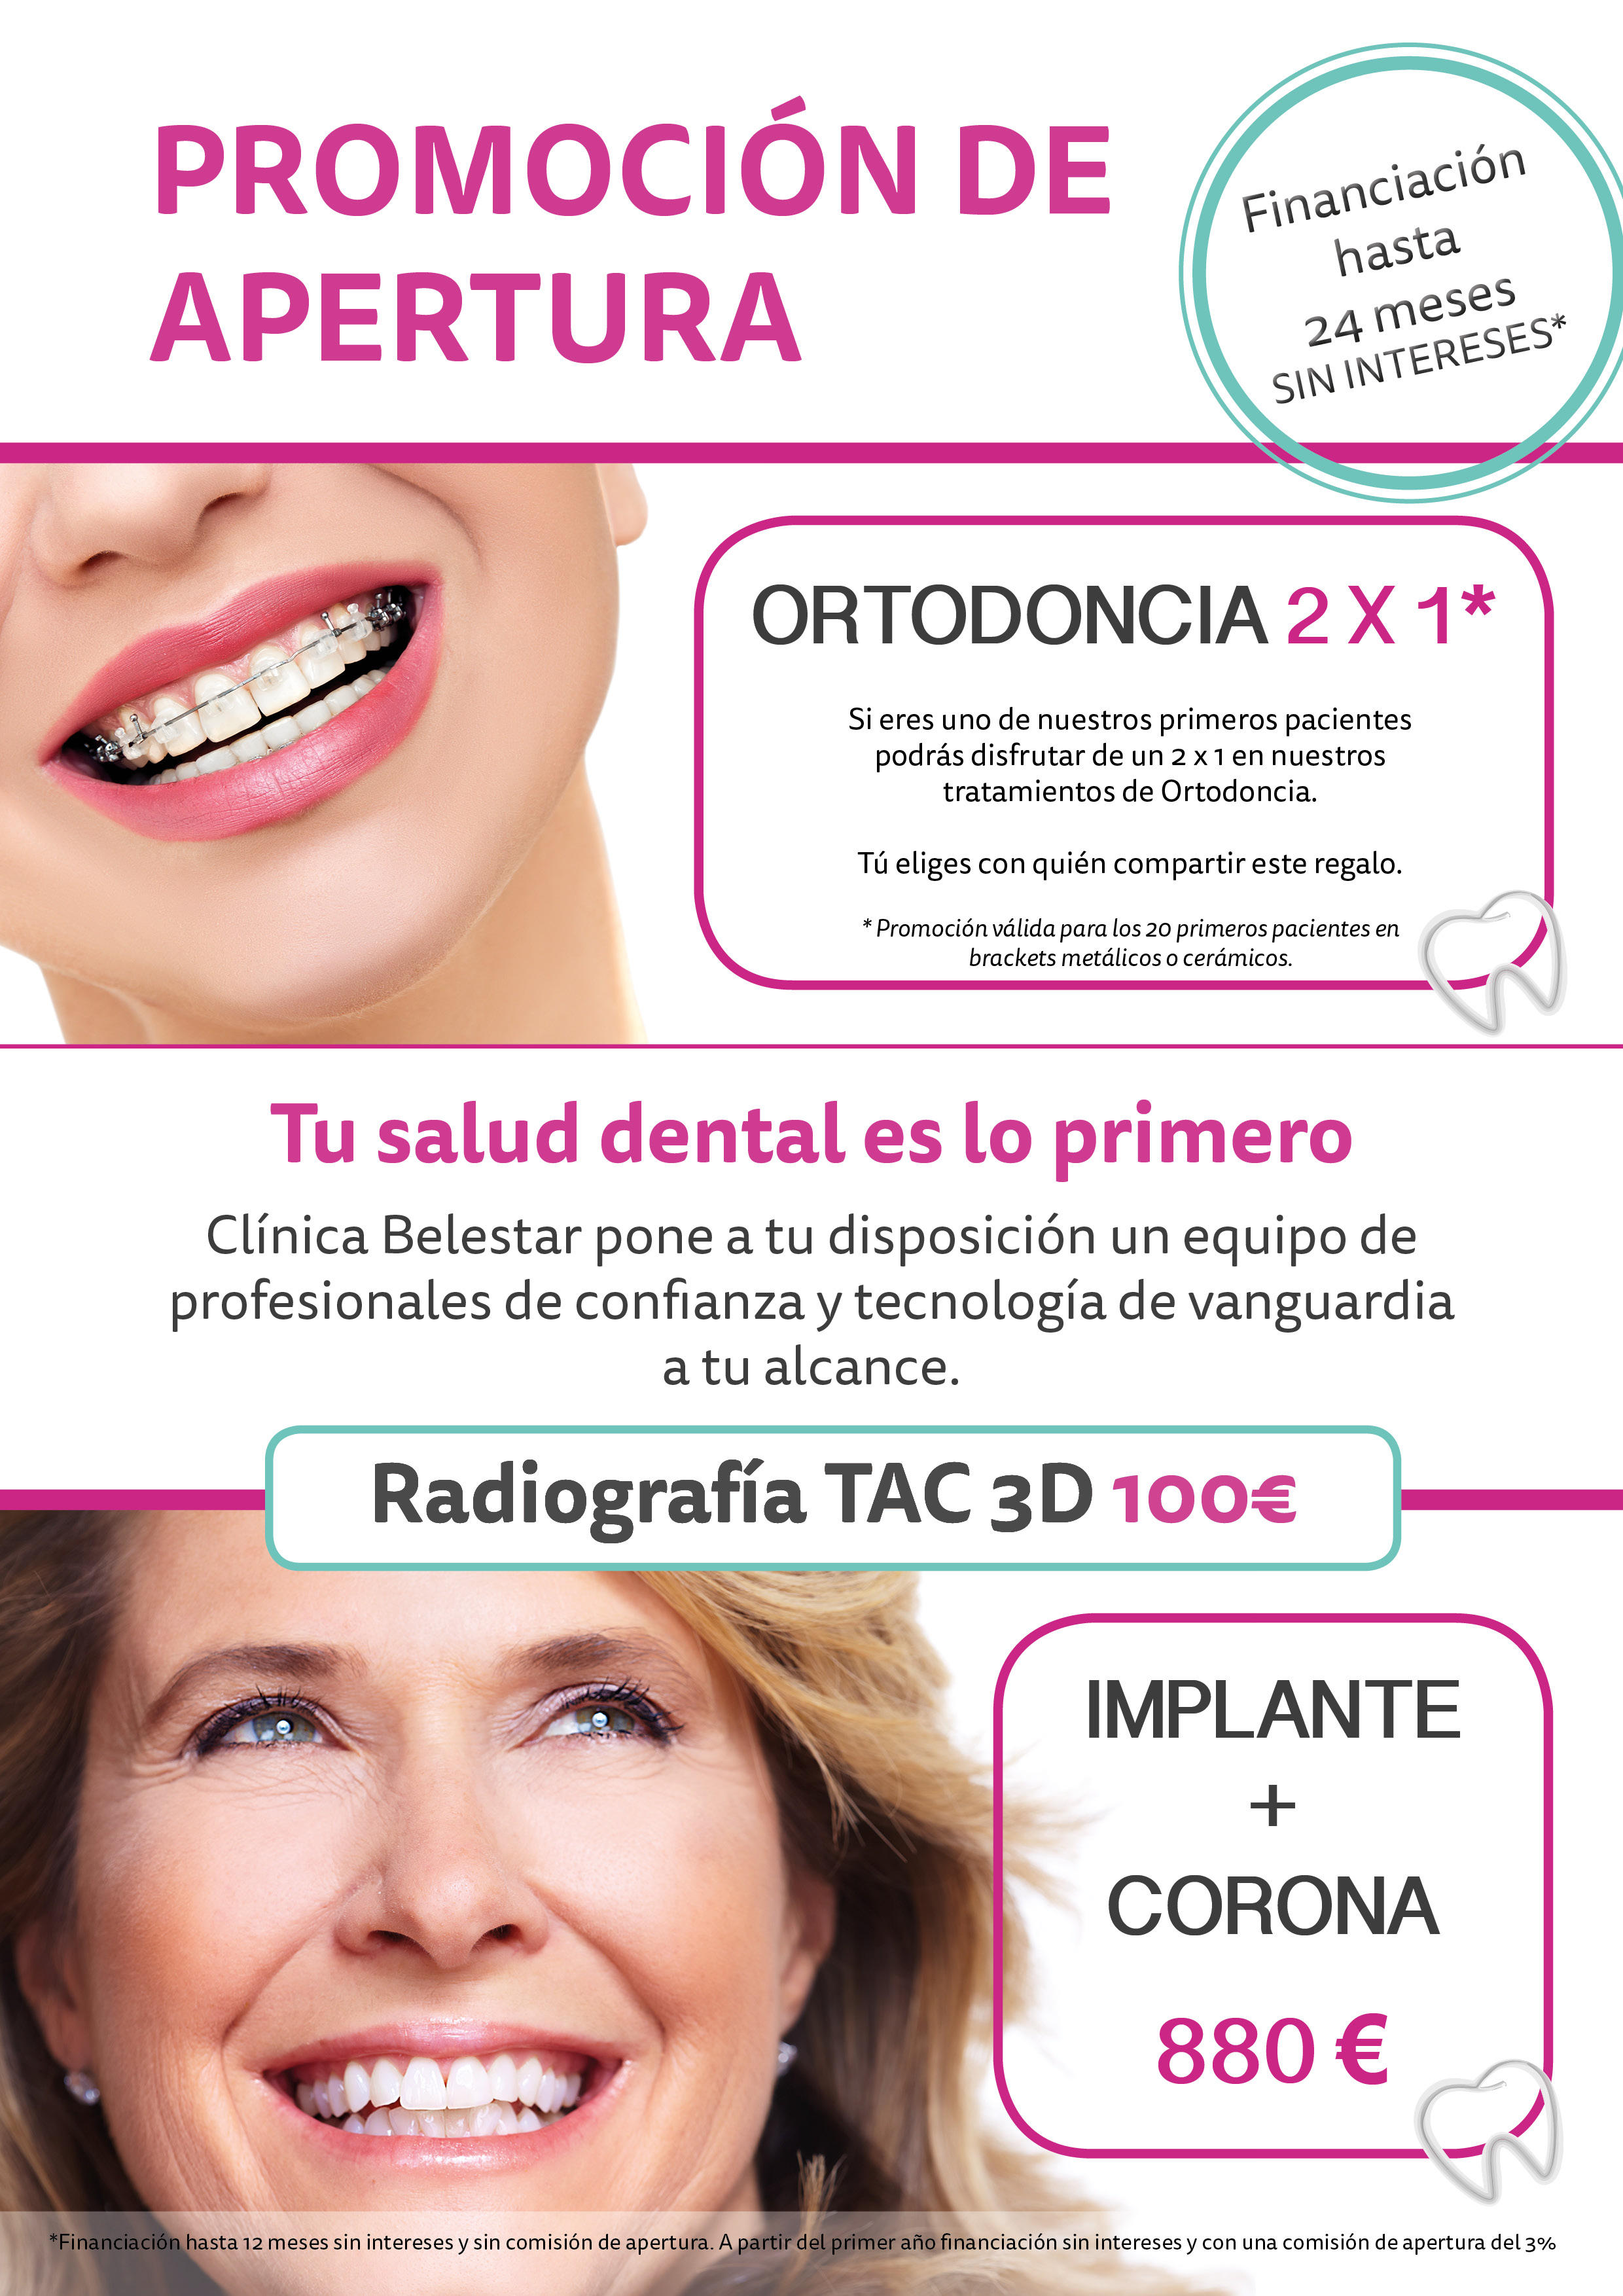 http://clinicabelestar.com/wp-content/uploads/2016/05/publi-fachada-mayo.jpg